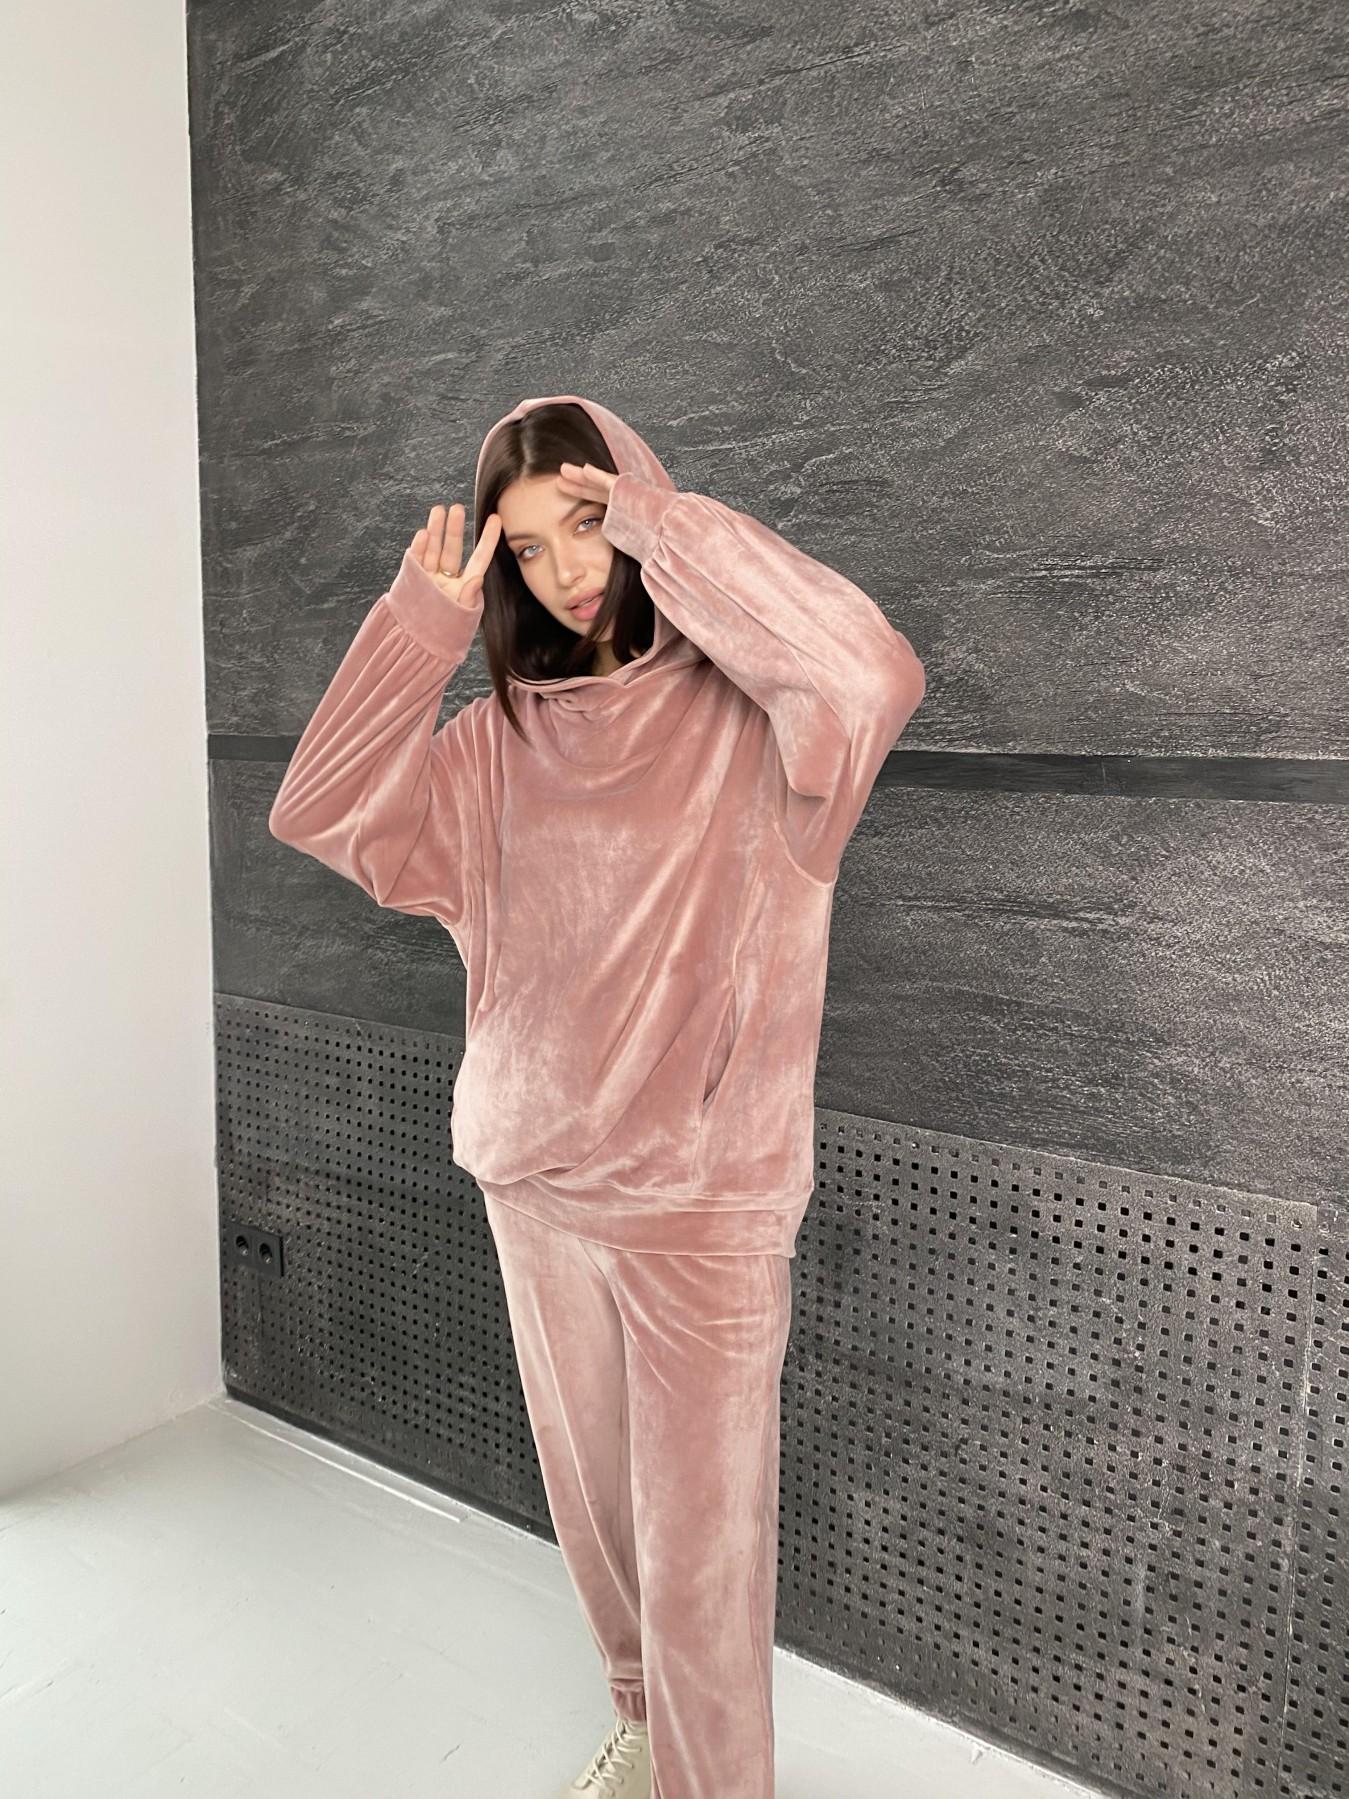 Марион Oversize  костюм из велюра 10690 АРТ. 47112 Цвет: Пудра - фото 1, интернет магазин tm-modus.ru